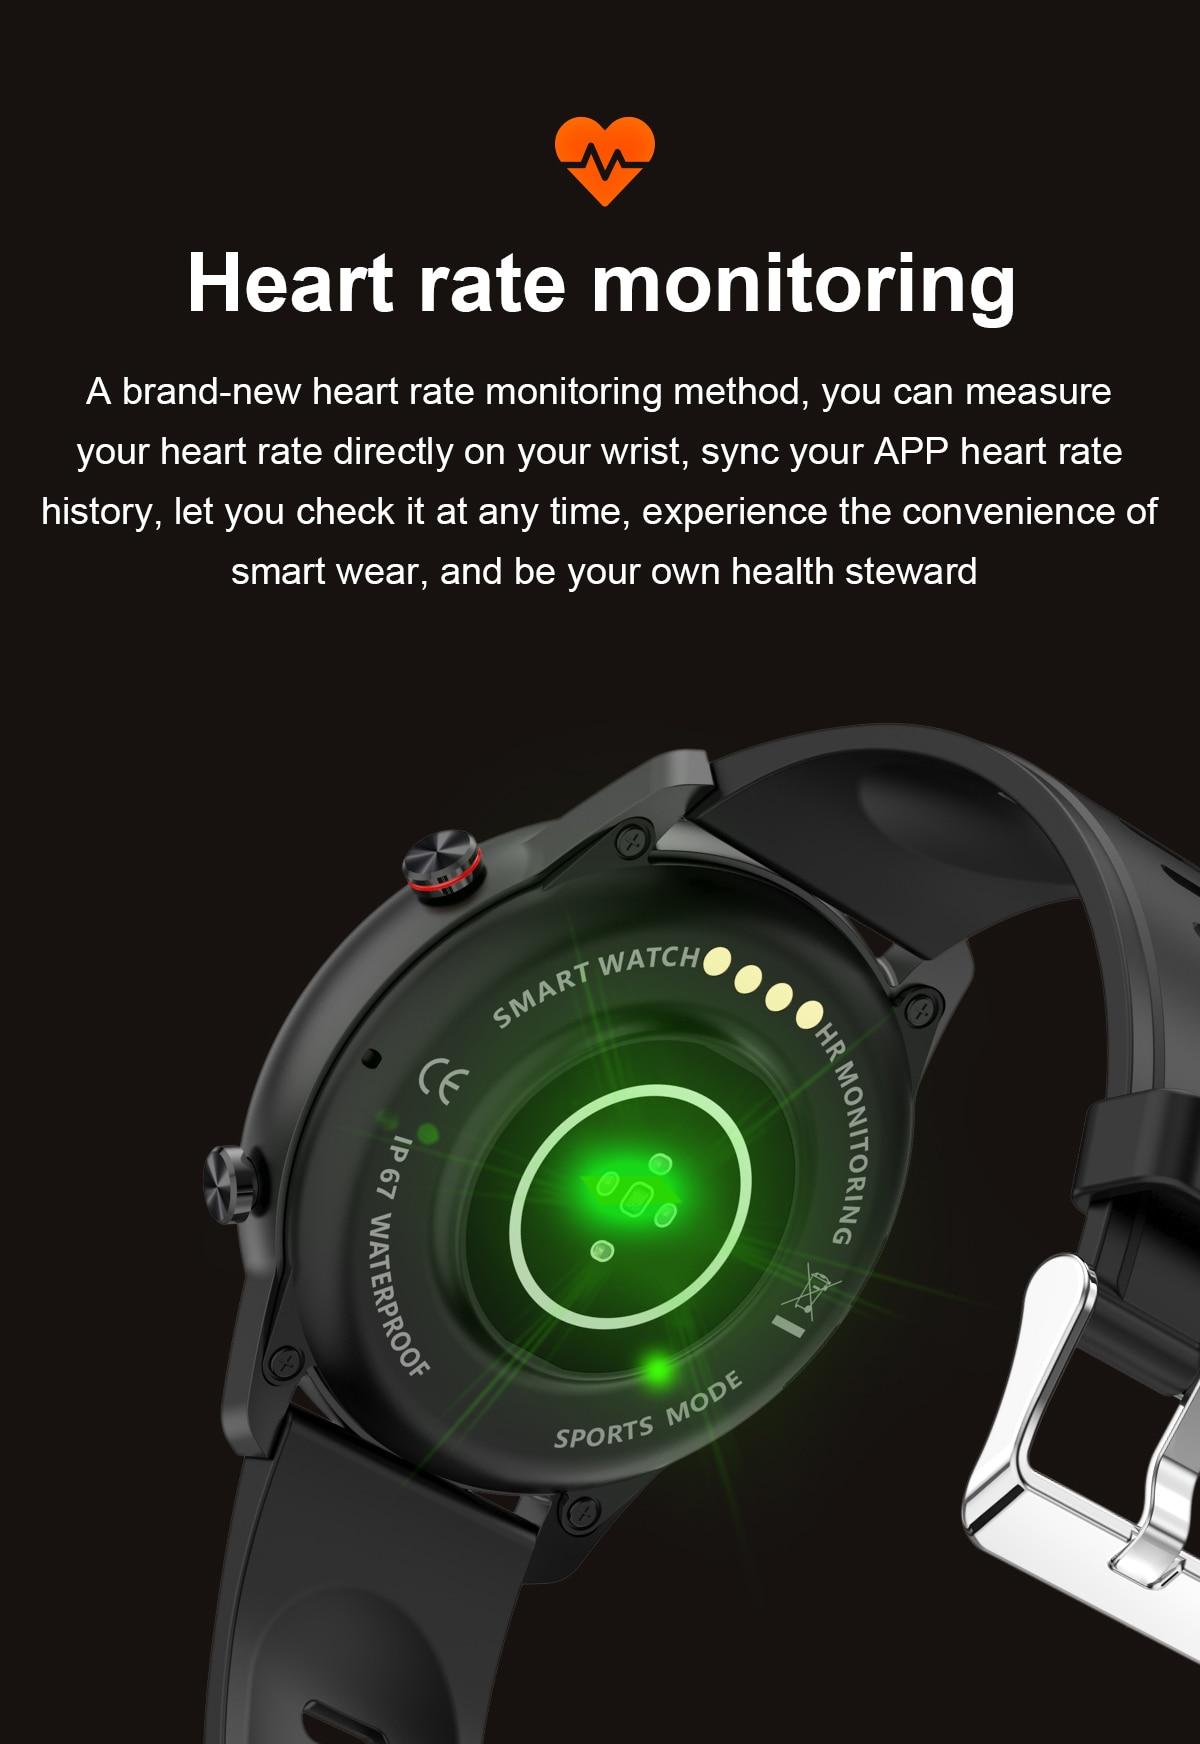 H0beadfd24bb24b5a834ba216cf3b9948b 2021 NEW Smart Watch Women Men Full Touch Fitness Tracker IP67 Waterproof Smartwatch For Android Xiaomi Redmi